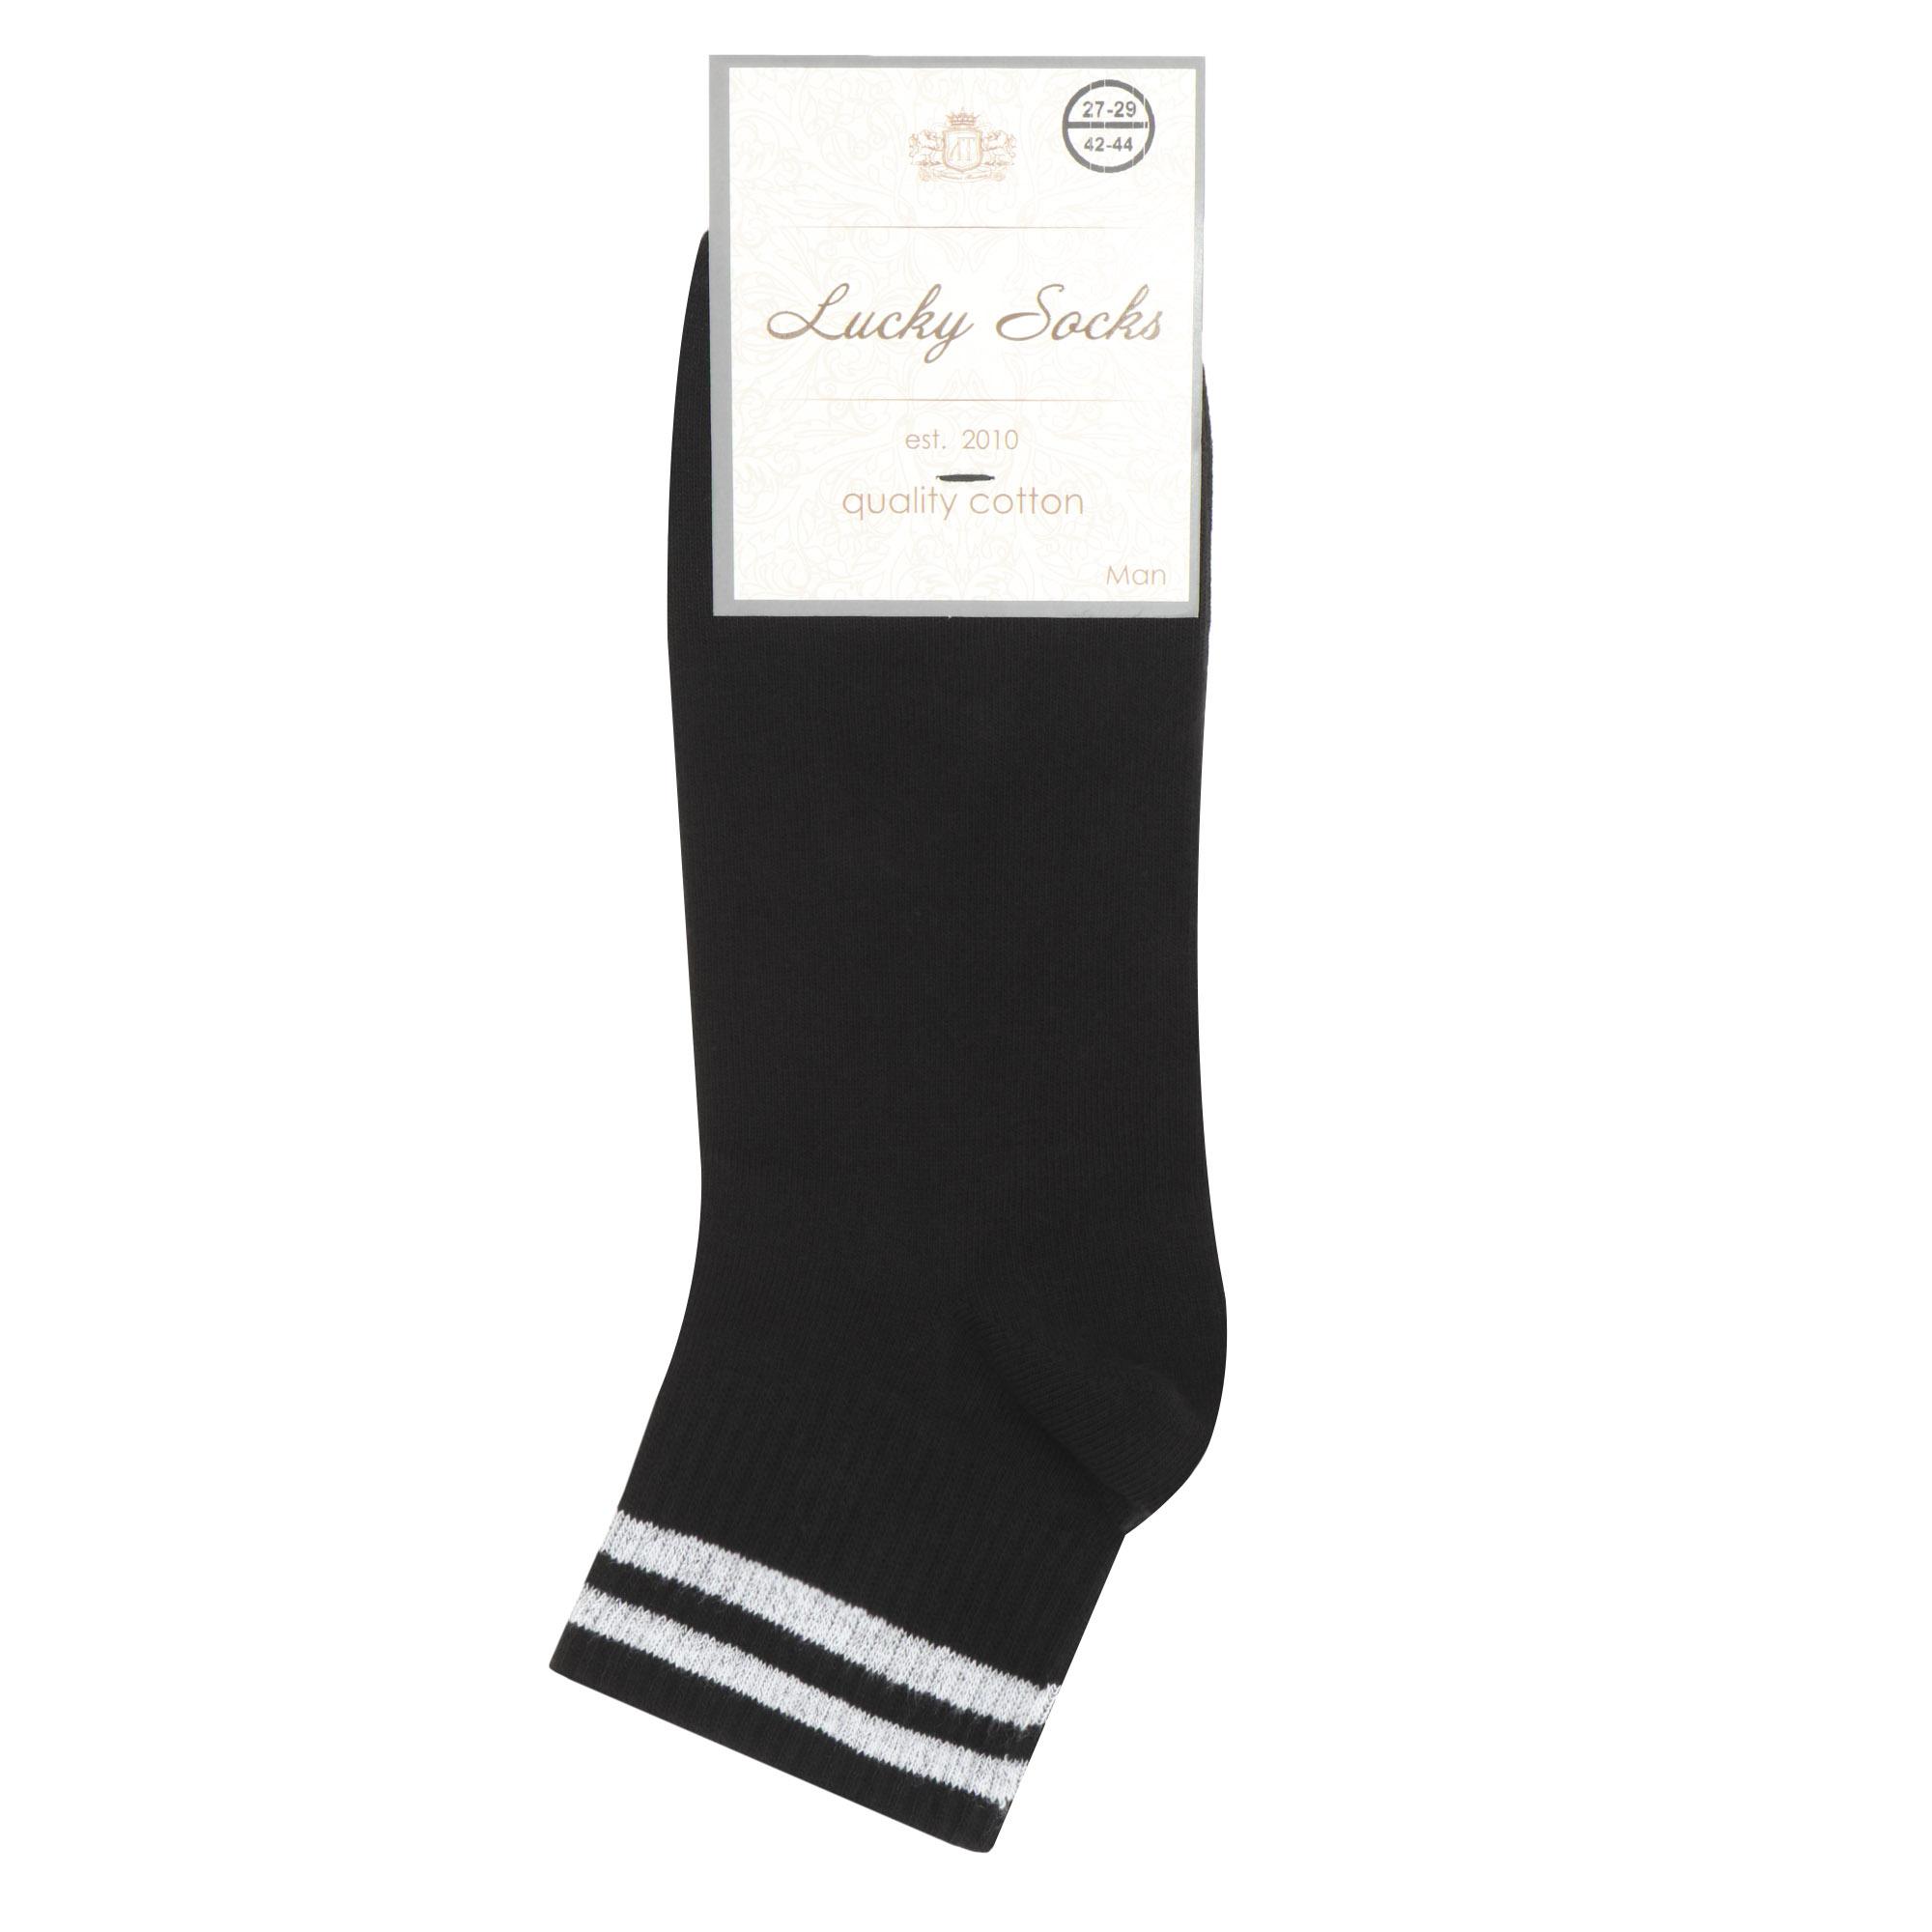 Носки мужские Lucky Socks НМГ-0131 черно-белые 27-29